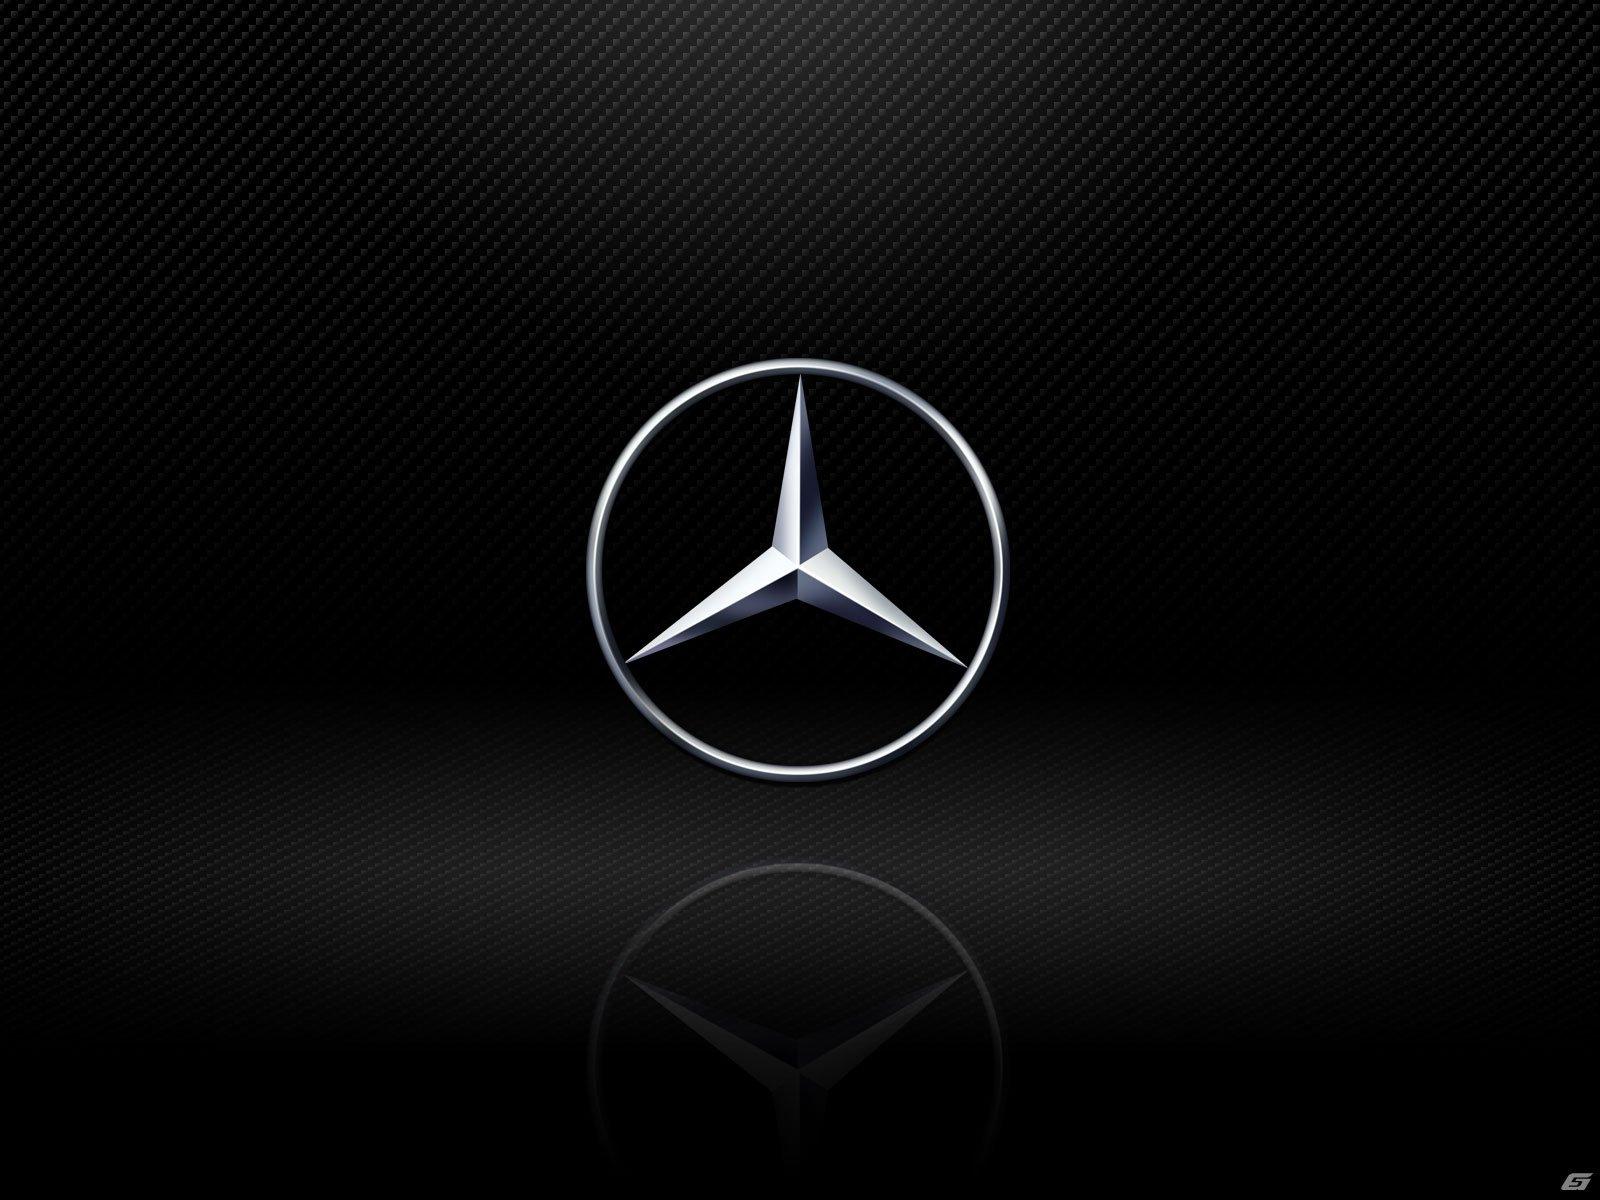 mercedes benz logo wallpaper for iphone 6